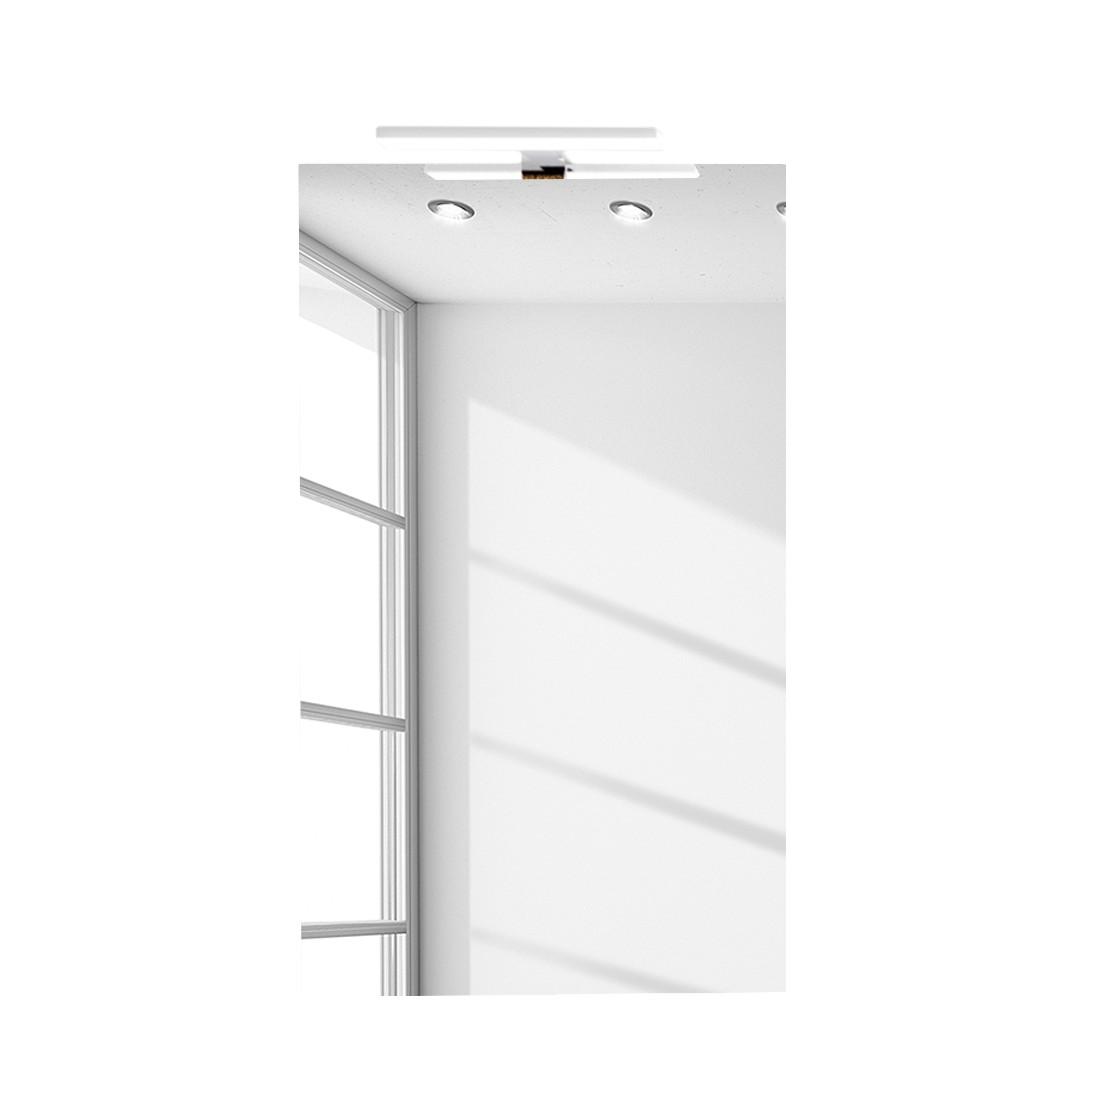 Leuchtspiegel Elva - 80 cm, Sieper